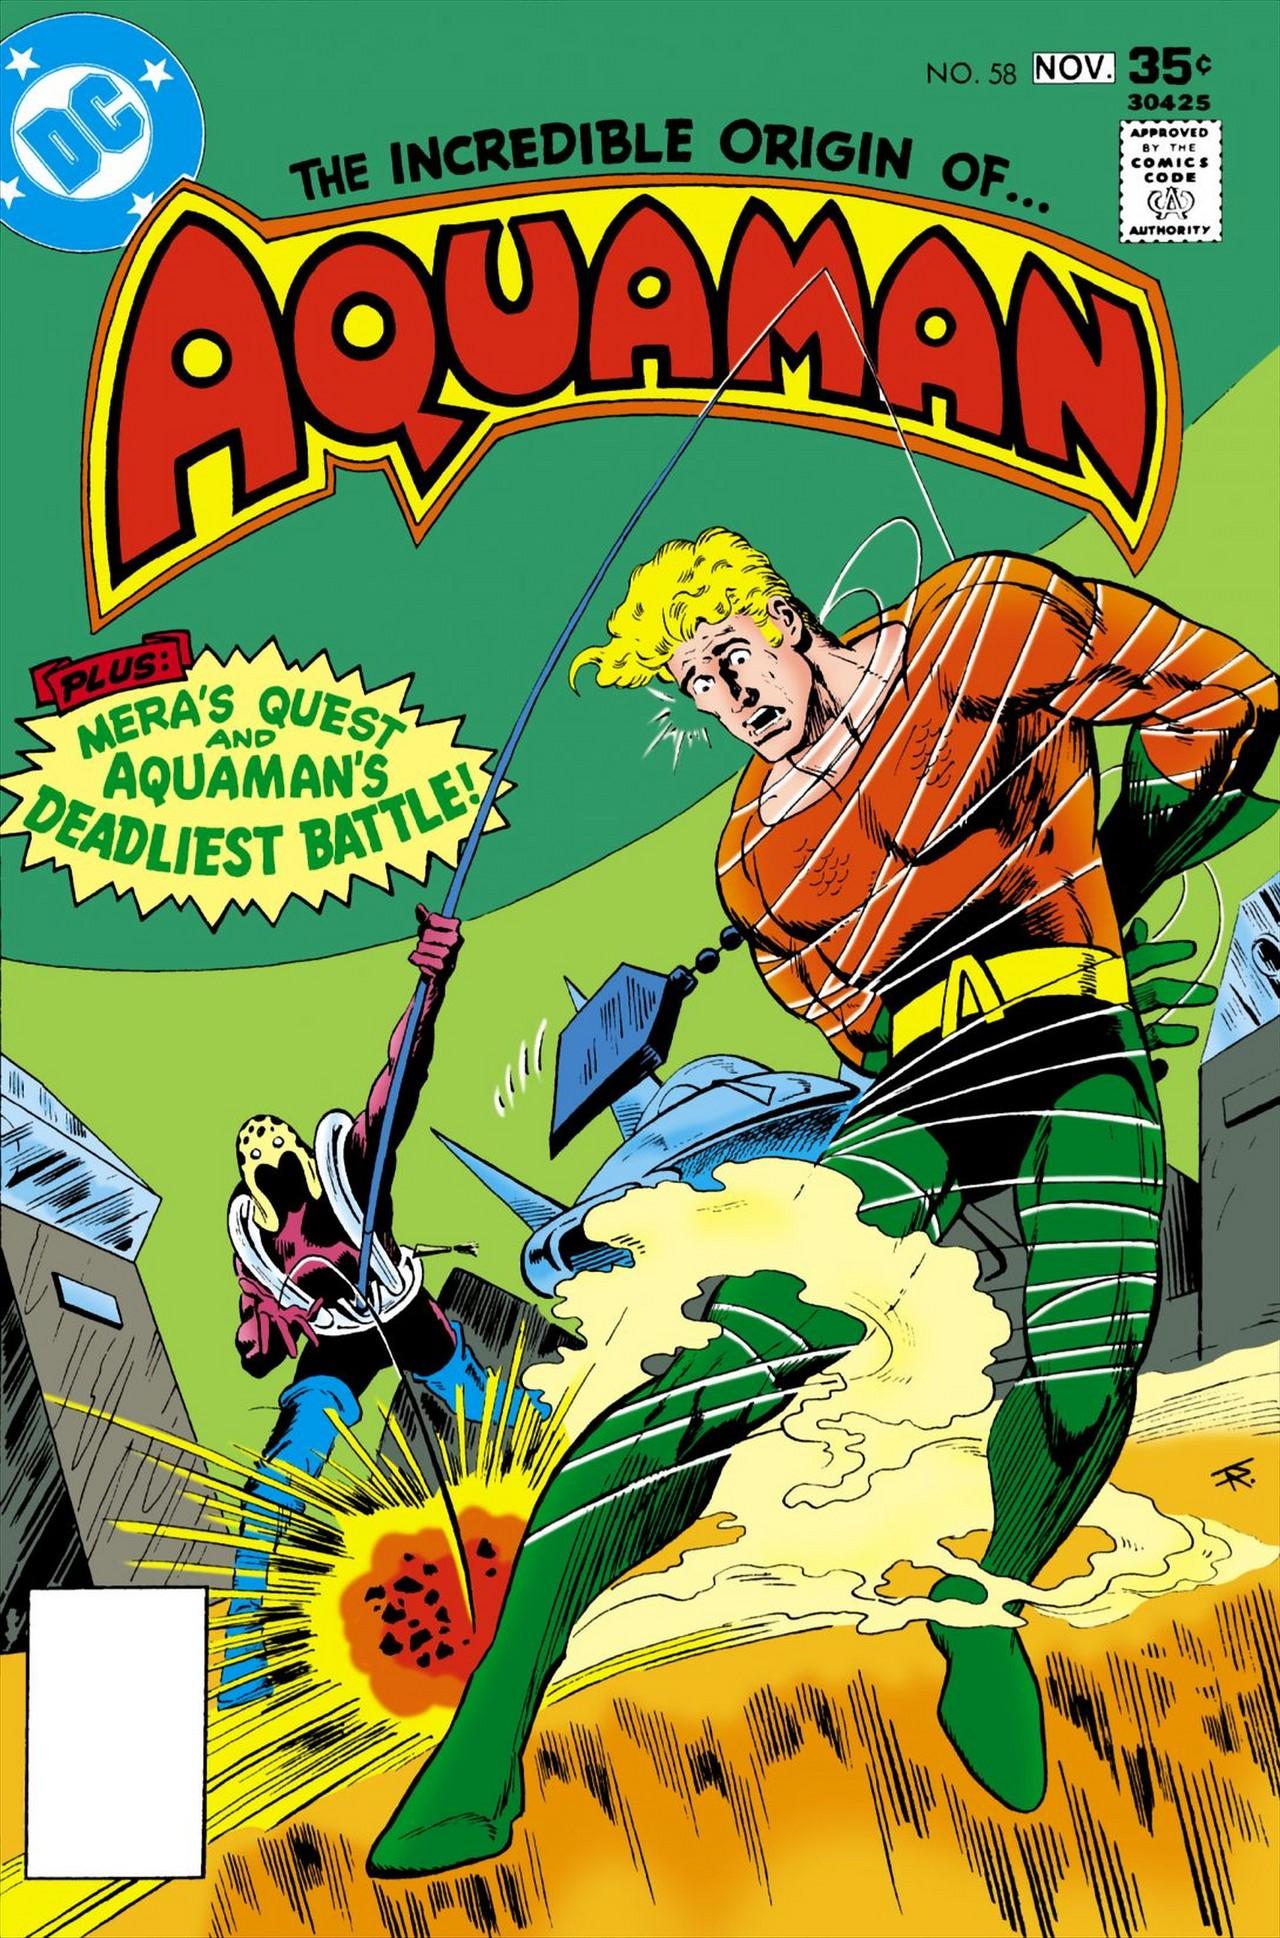 Read online Aquaman (1962) comic -  Issue #58 - 1